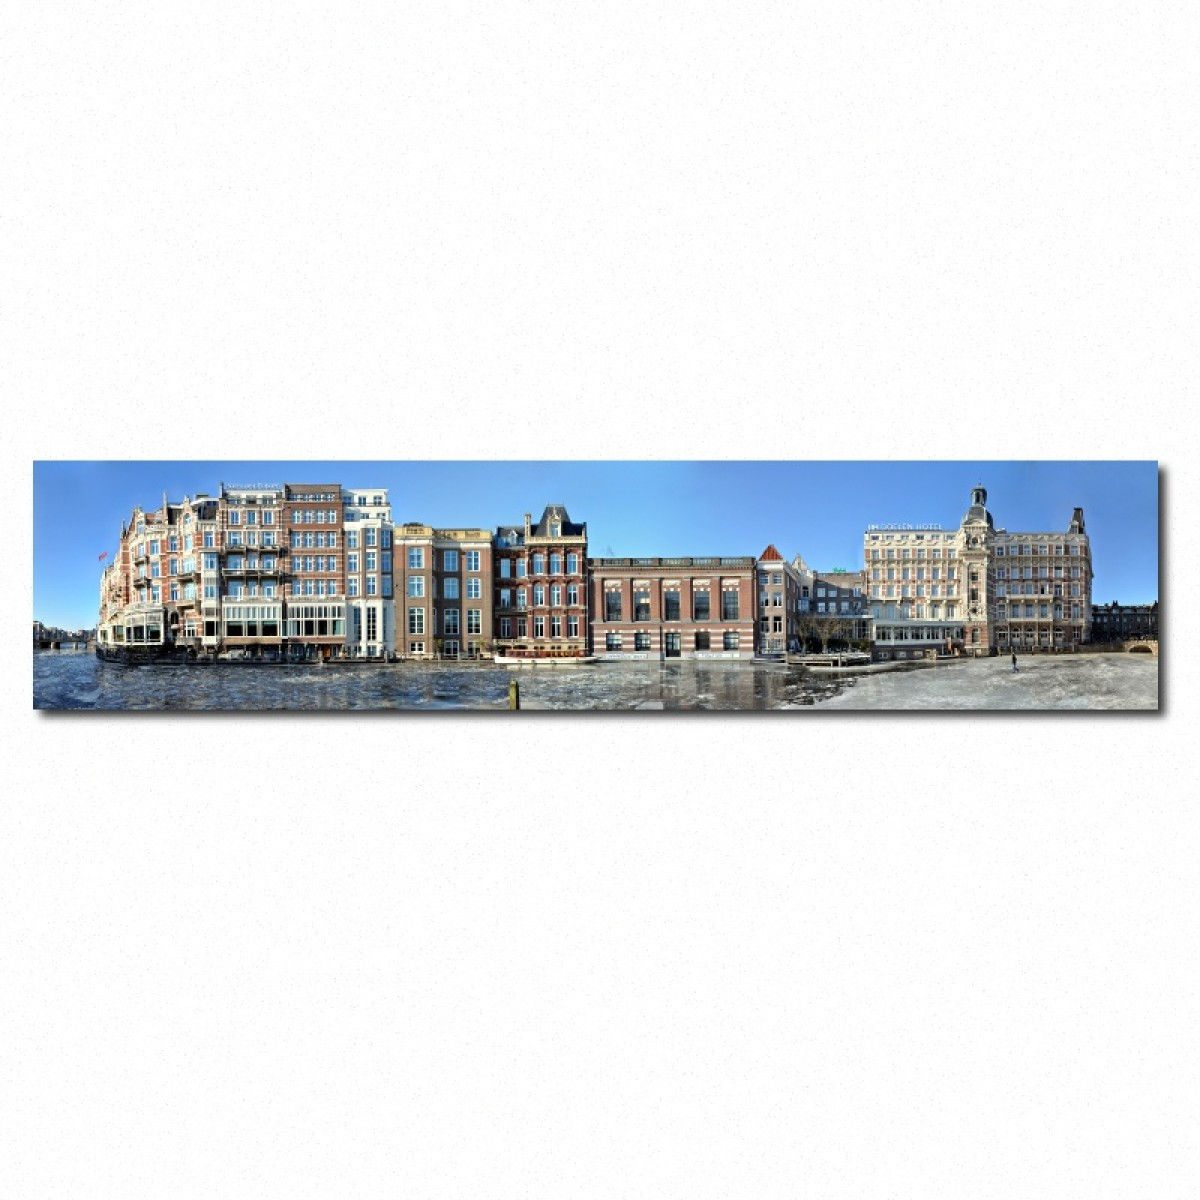 Amsterdam Streetline Panorama Gallery Print